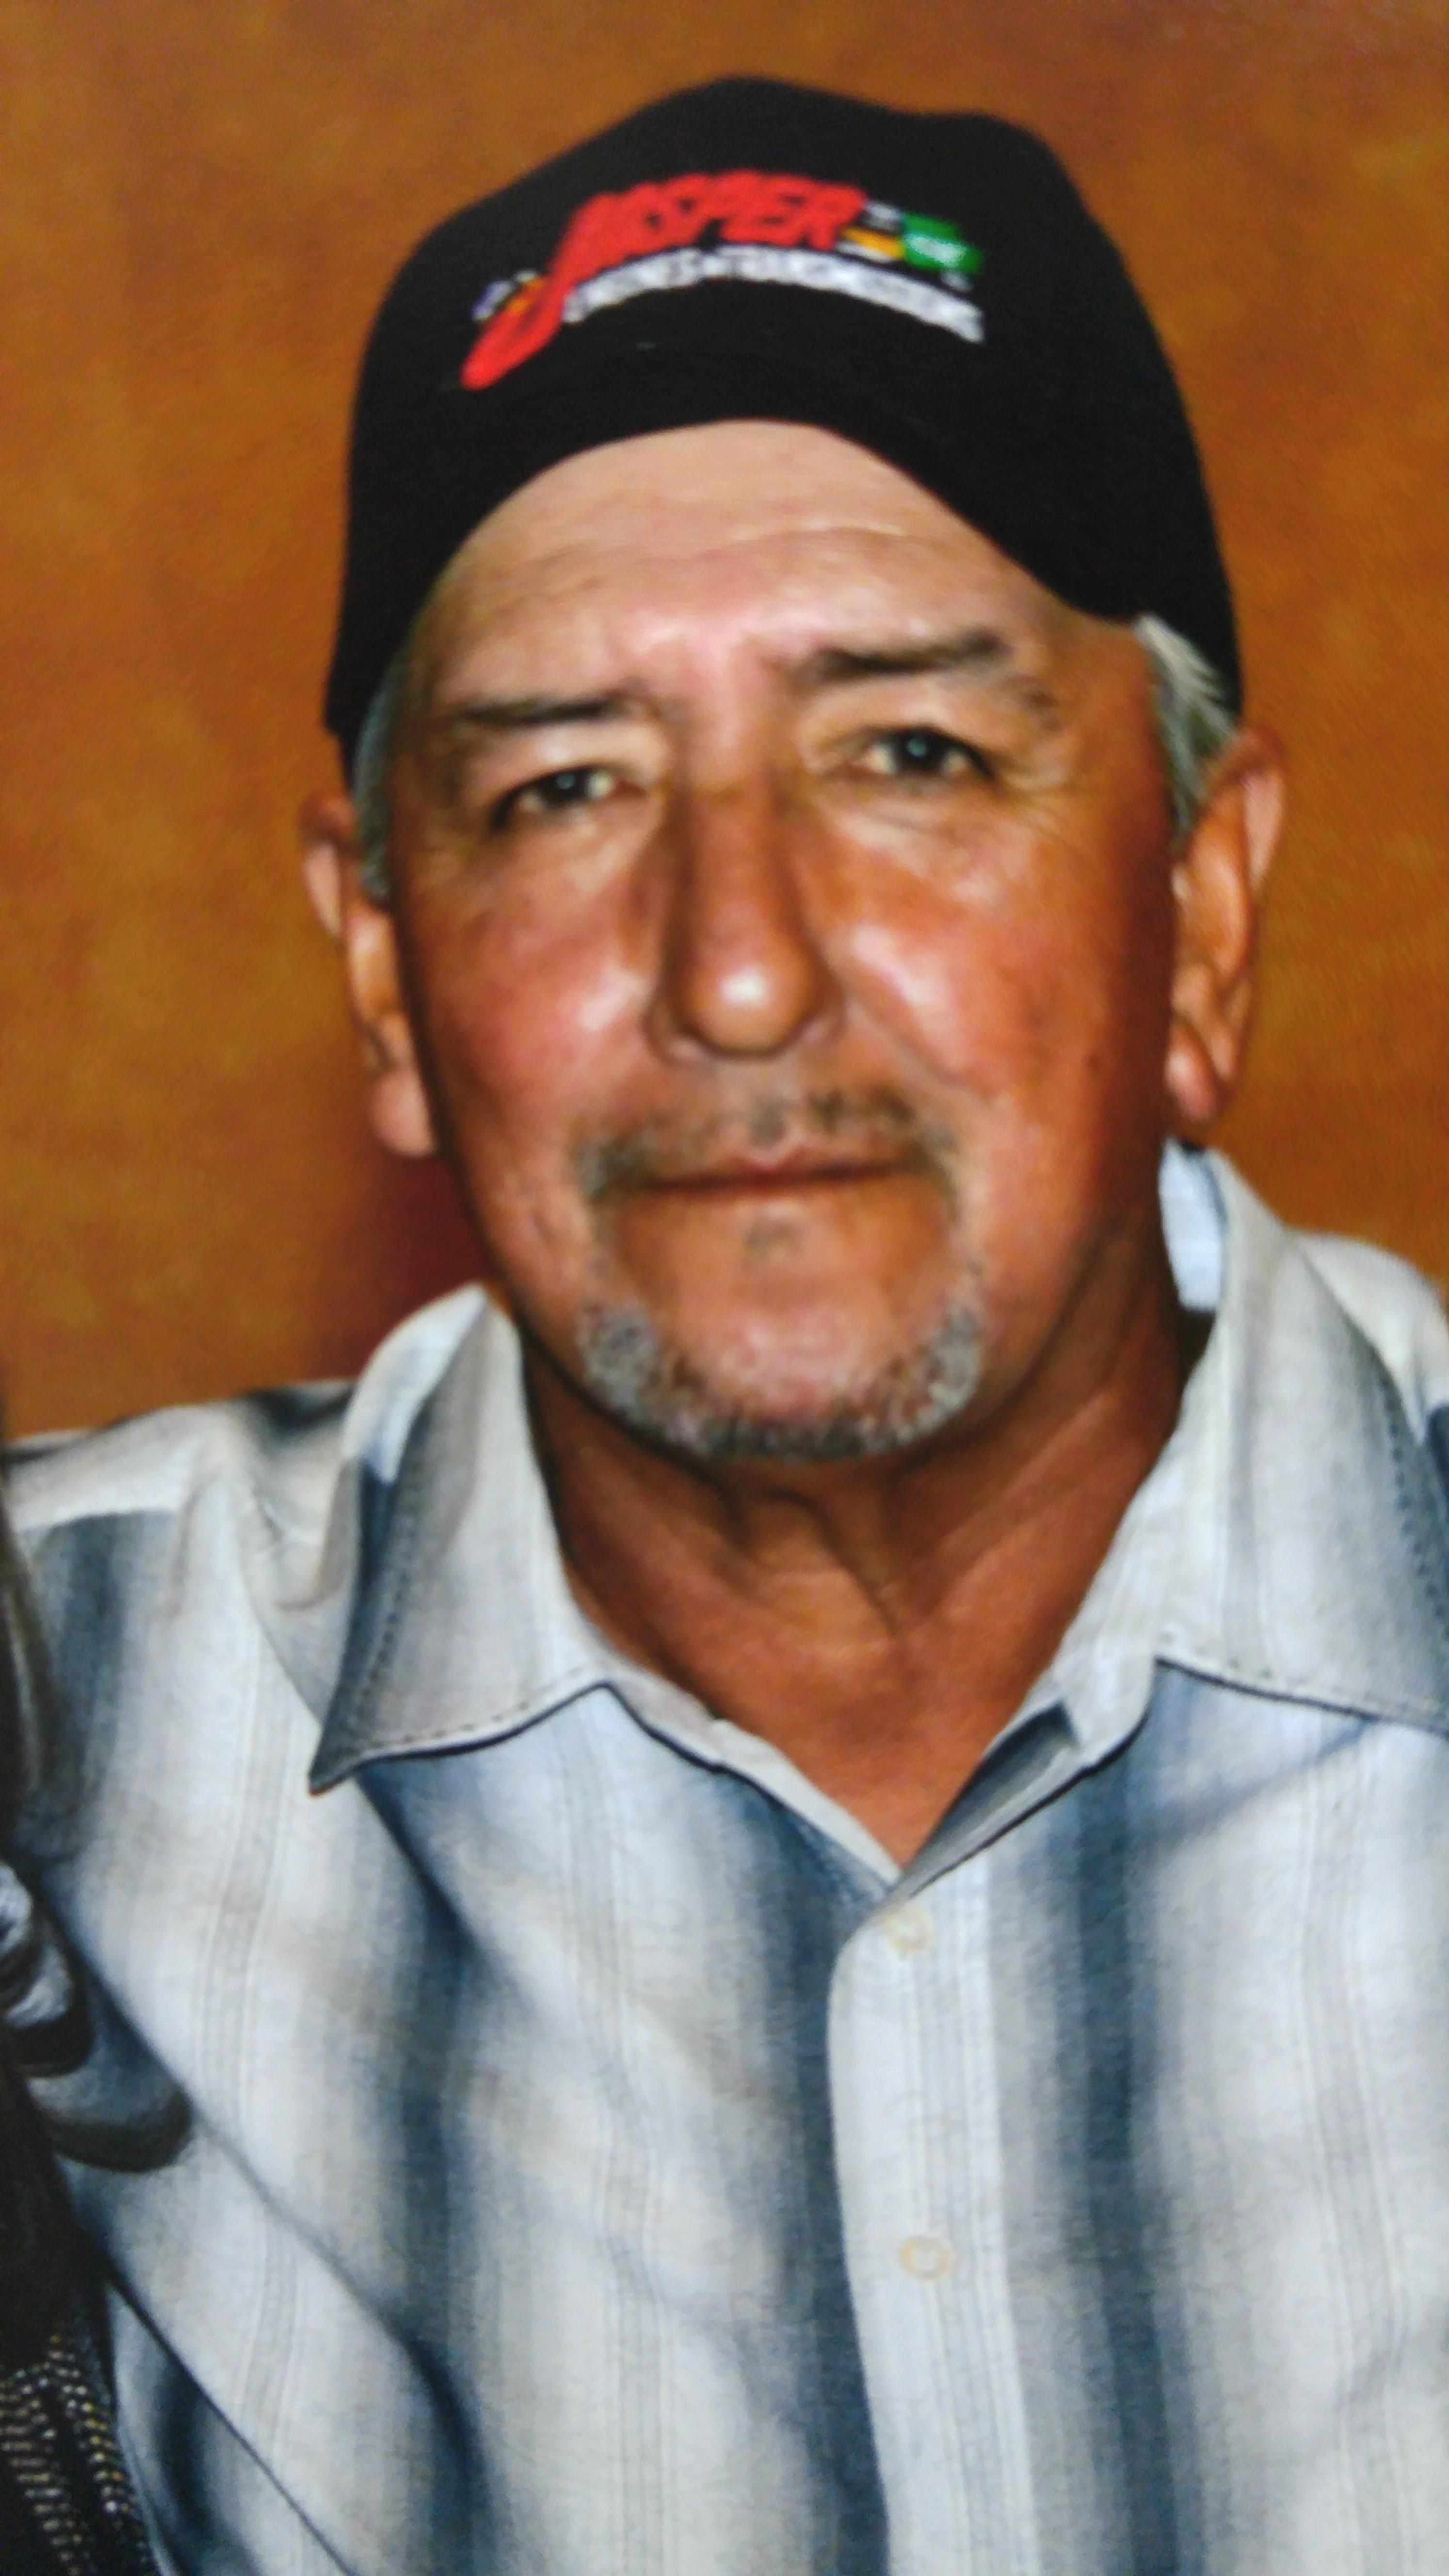 Martin Eugene Fuentes